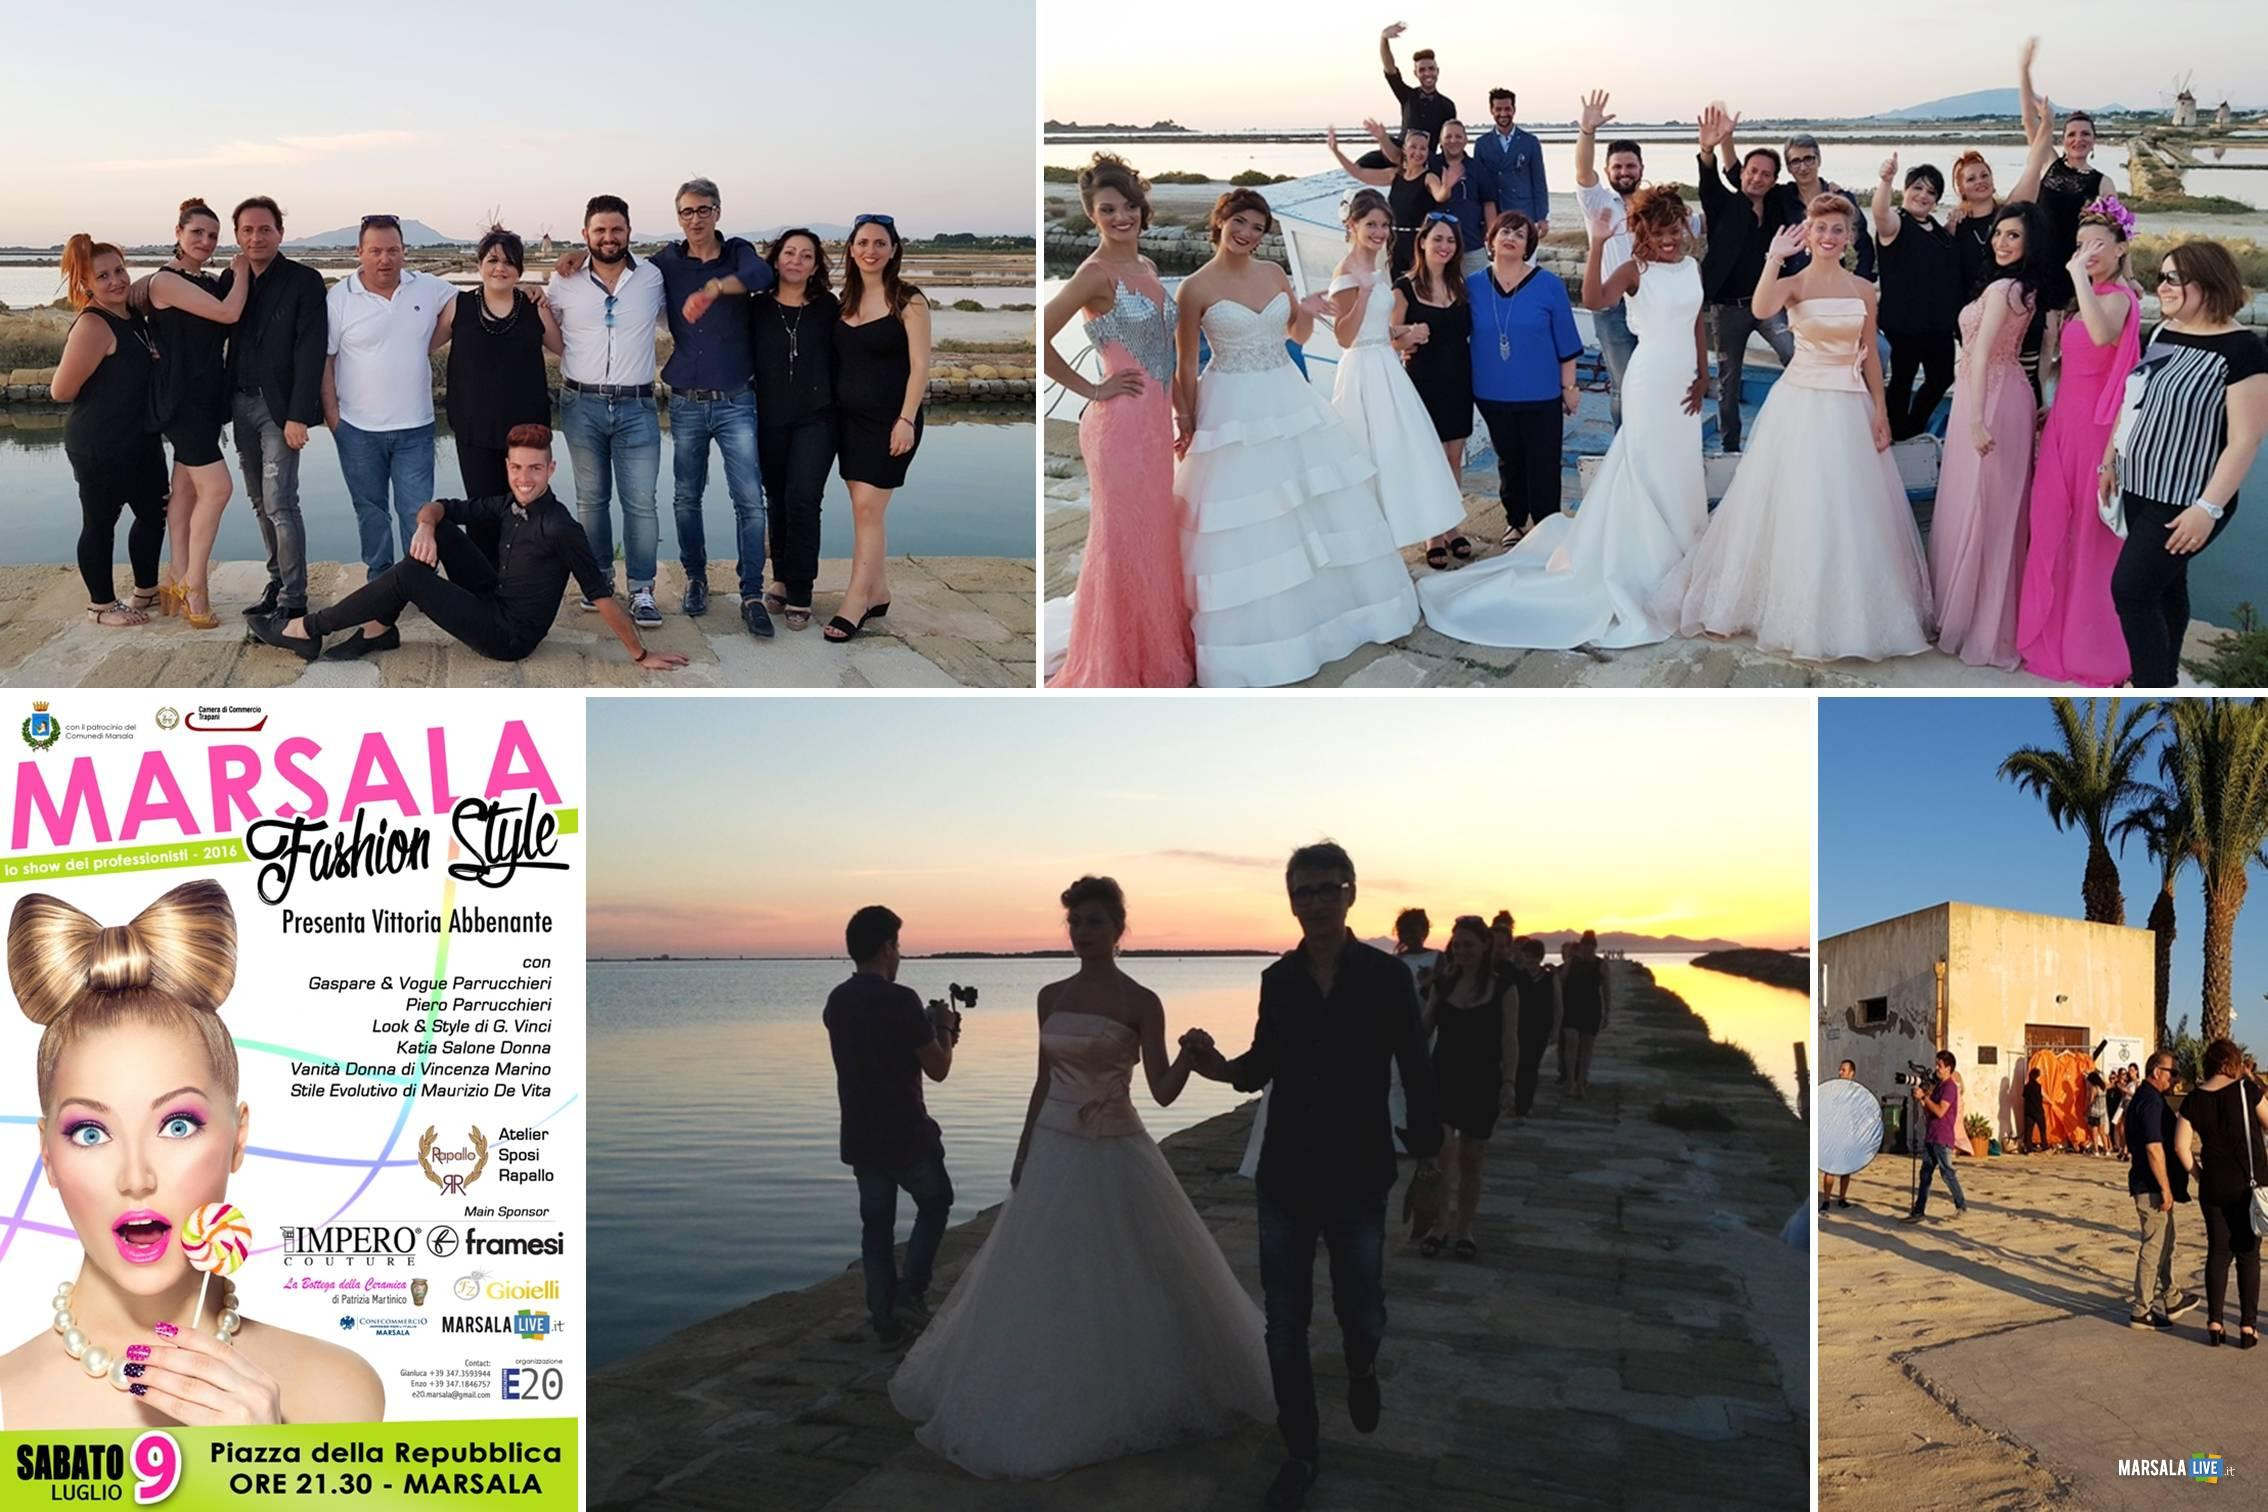 Marsala-fashion-style-2016-e20